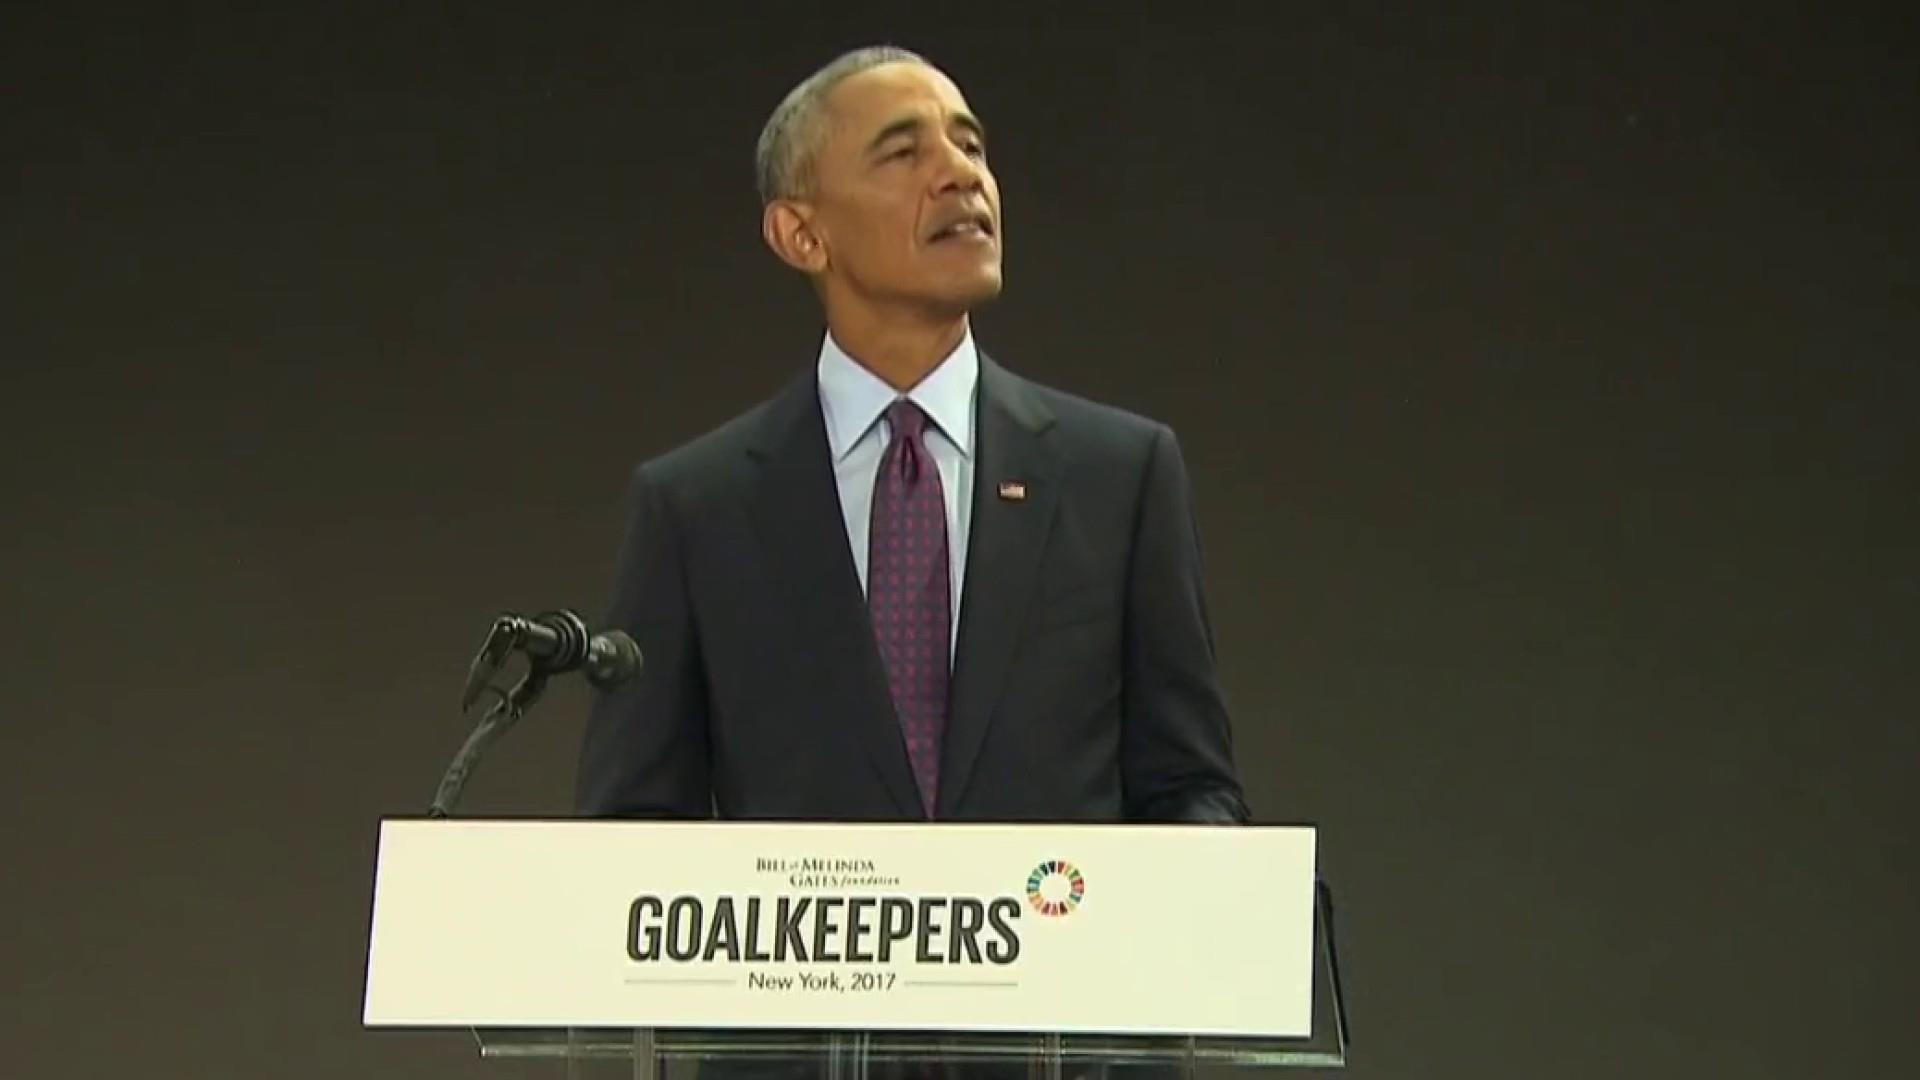 Pres. Obama and Jon Stewart; different method, same message